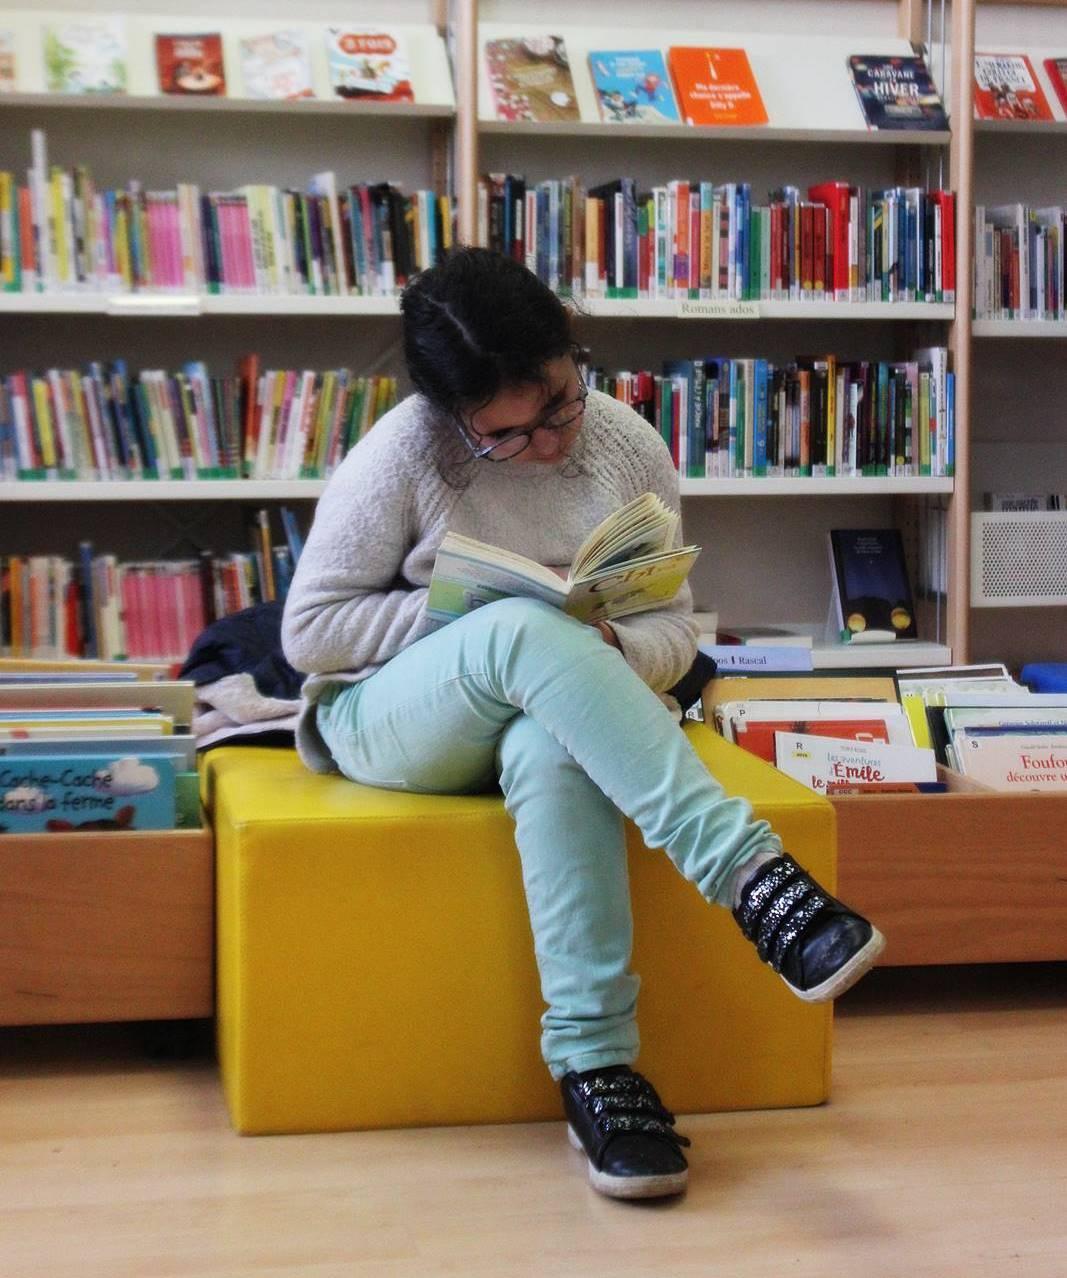 Bibliotheque ouverte le dimanche